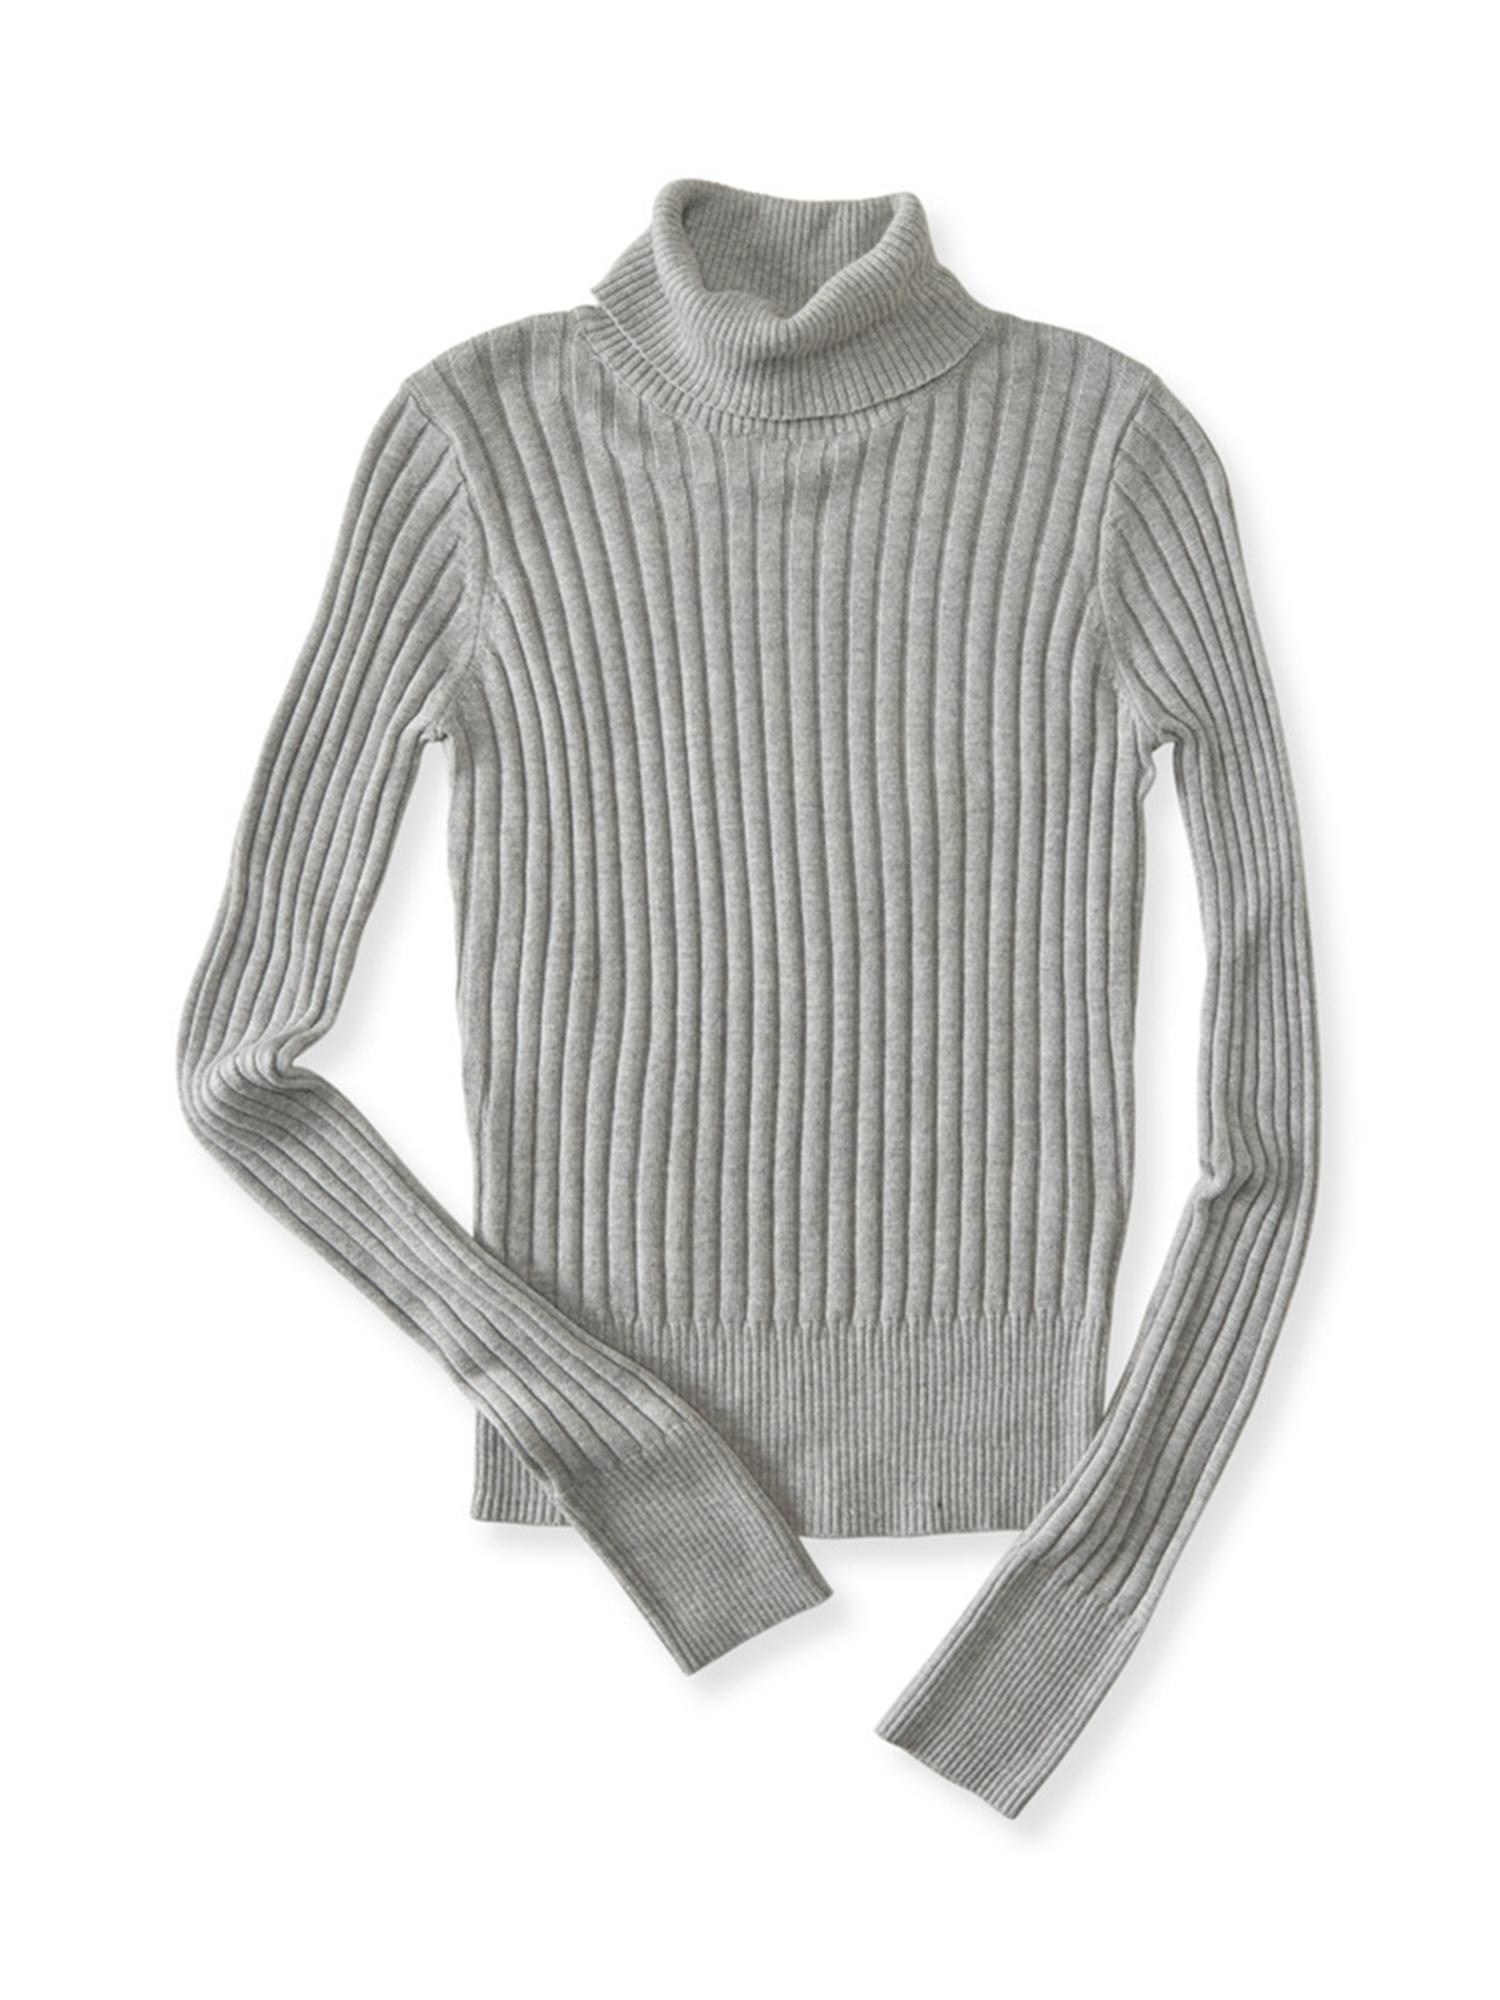 Aeropostale Juniors Ribbed Turtleneck Knit Sweater